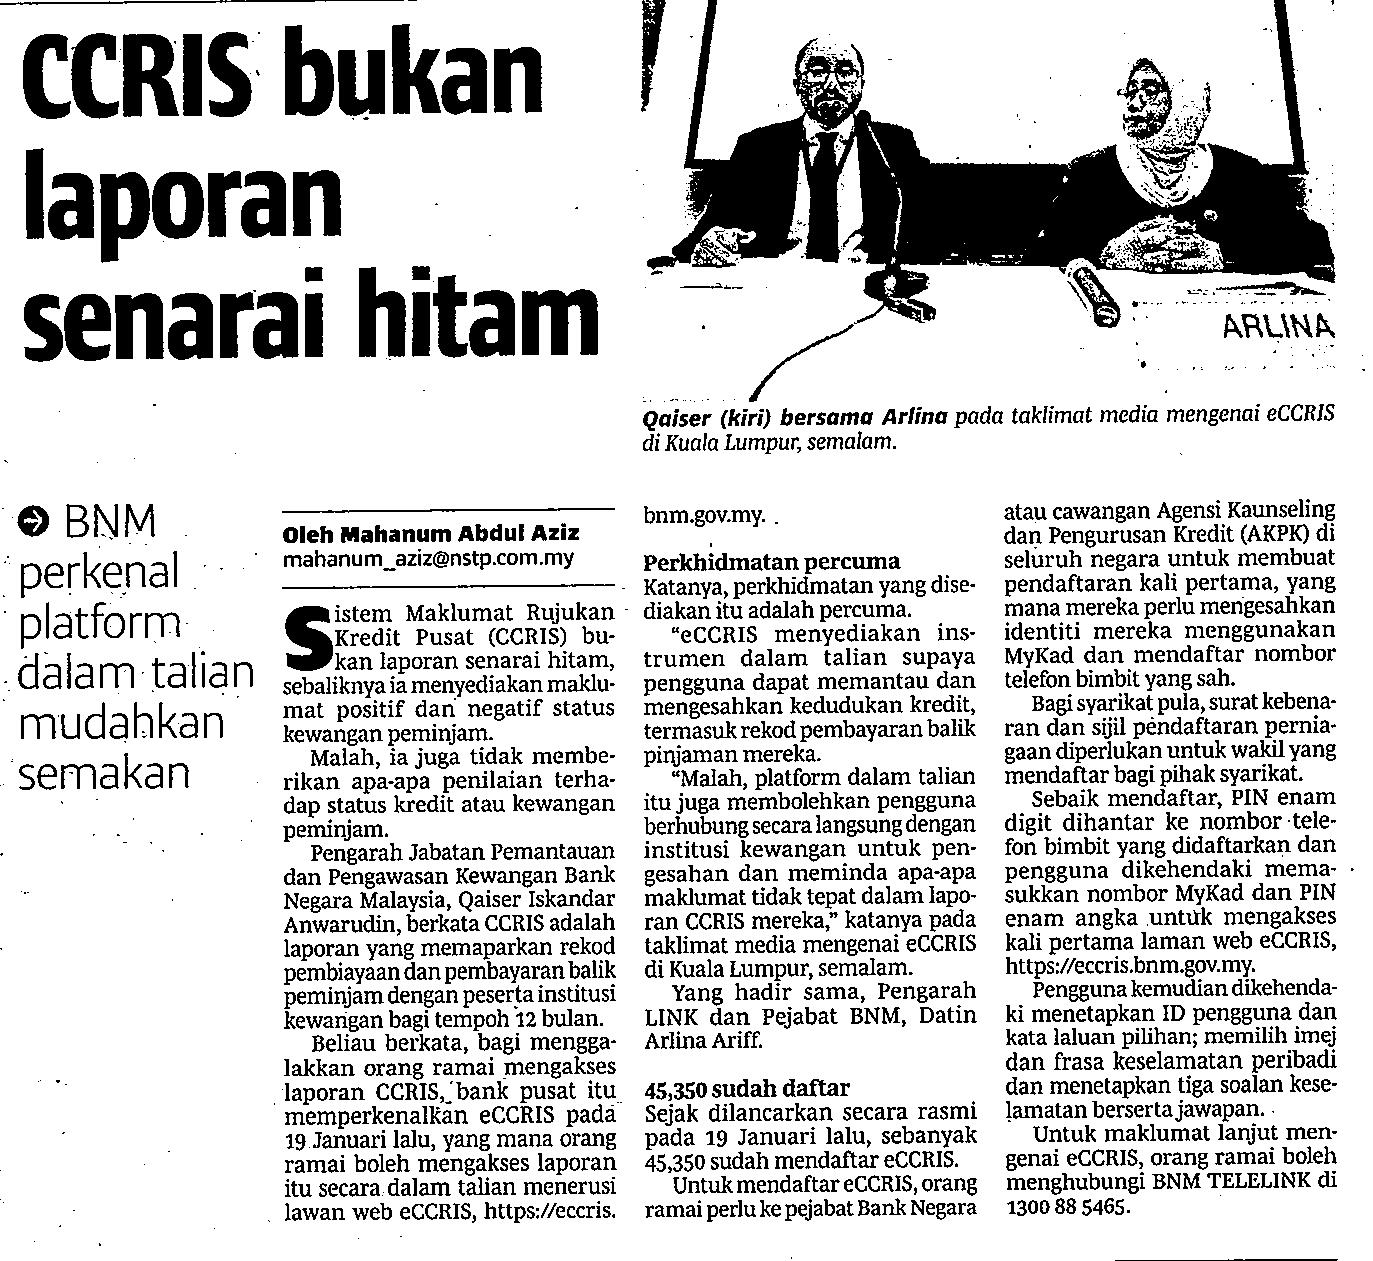 Perbadanan Perusahaan Kecil Dan Sederhana Malaysia Ccris Bukan Laporan Senarai Hitam